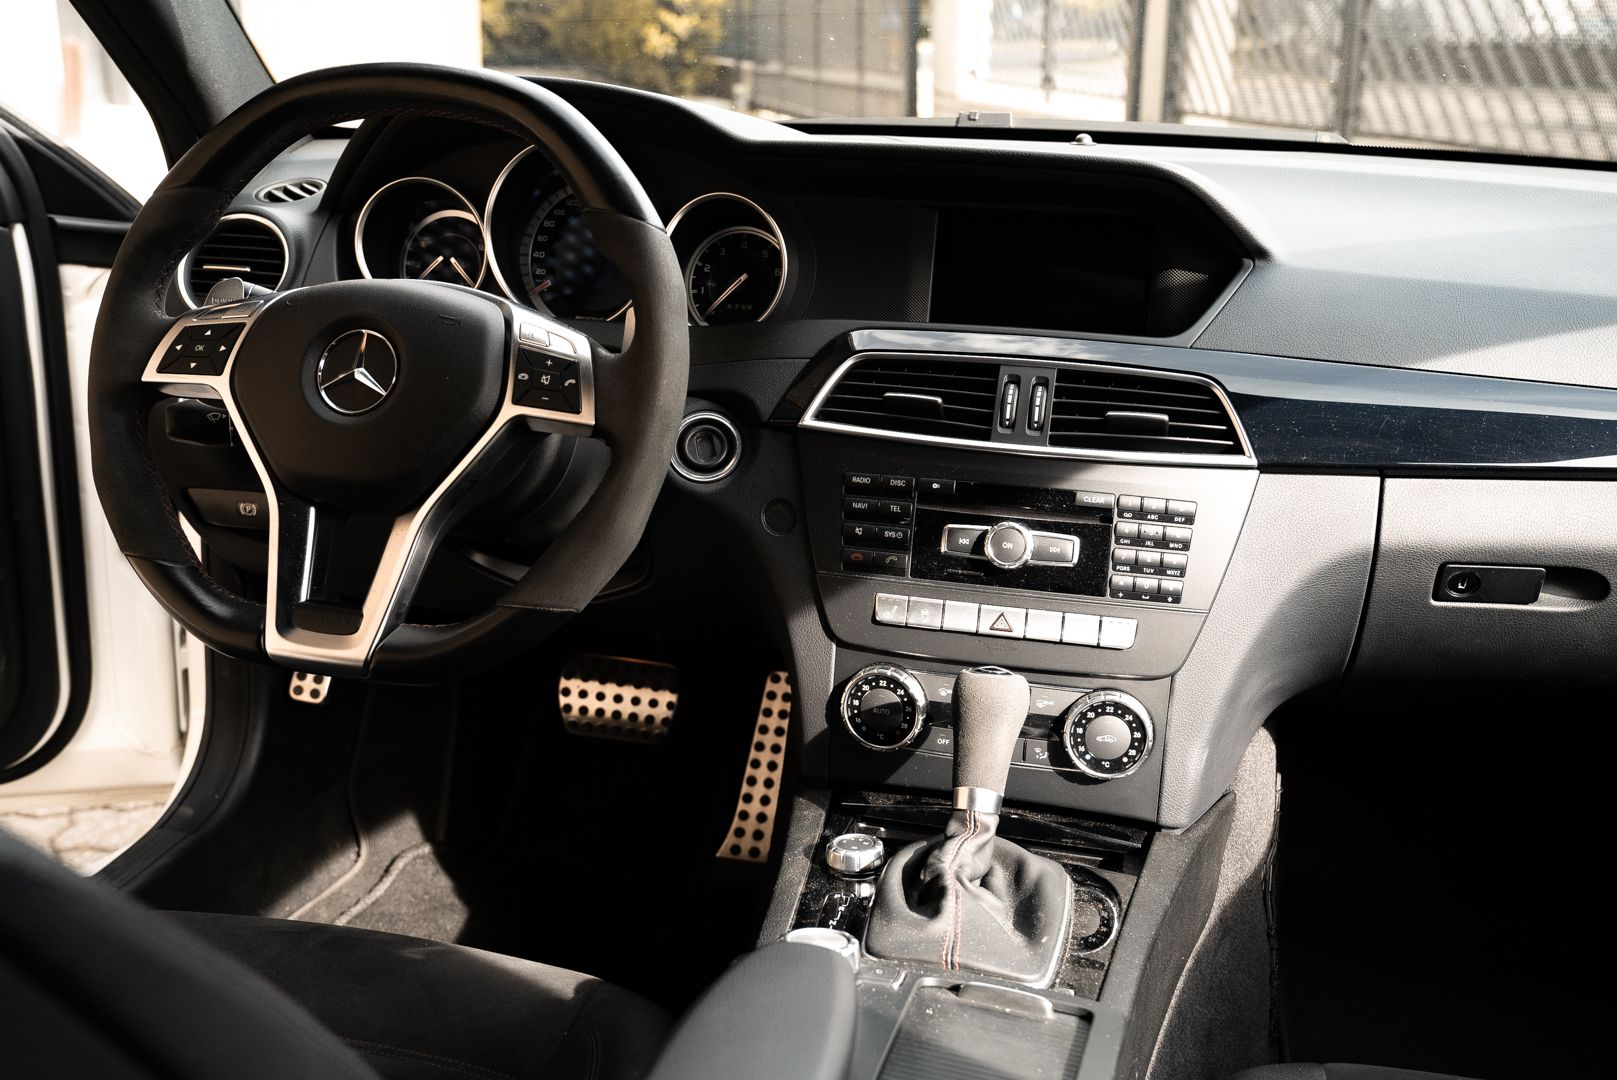 2012 Mercedes-Benz C63 AMG Black Series 71786